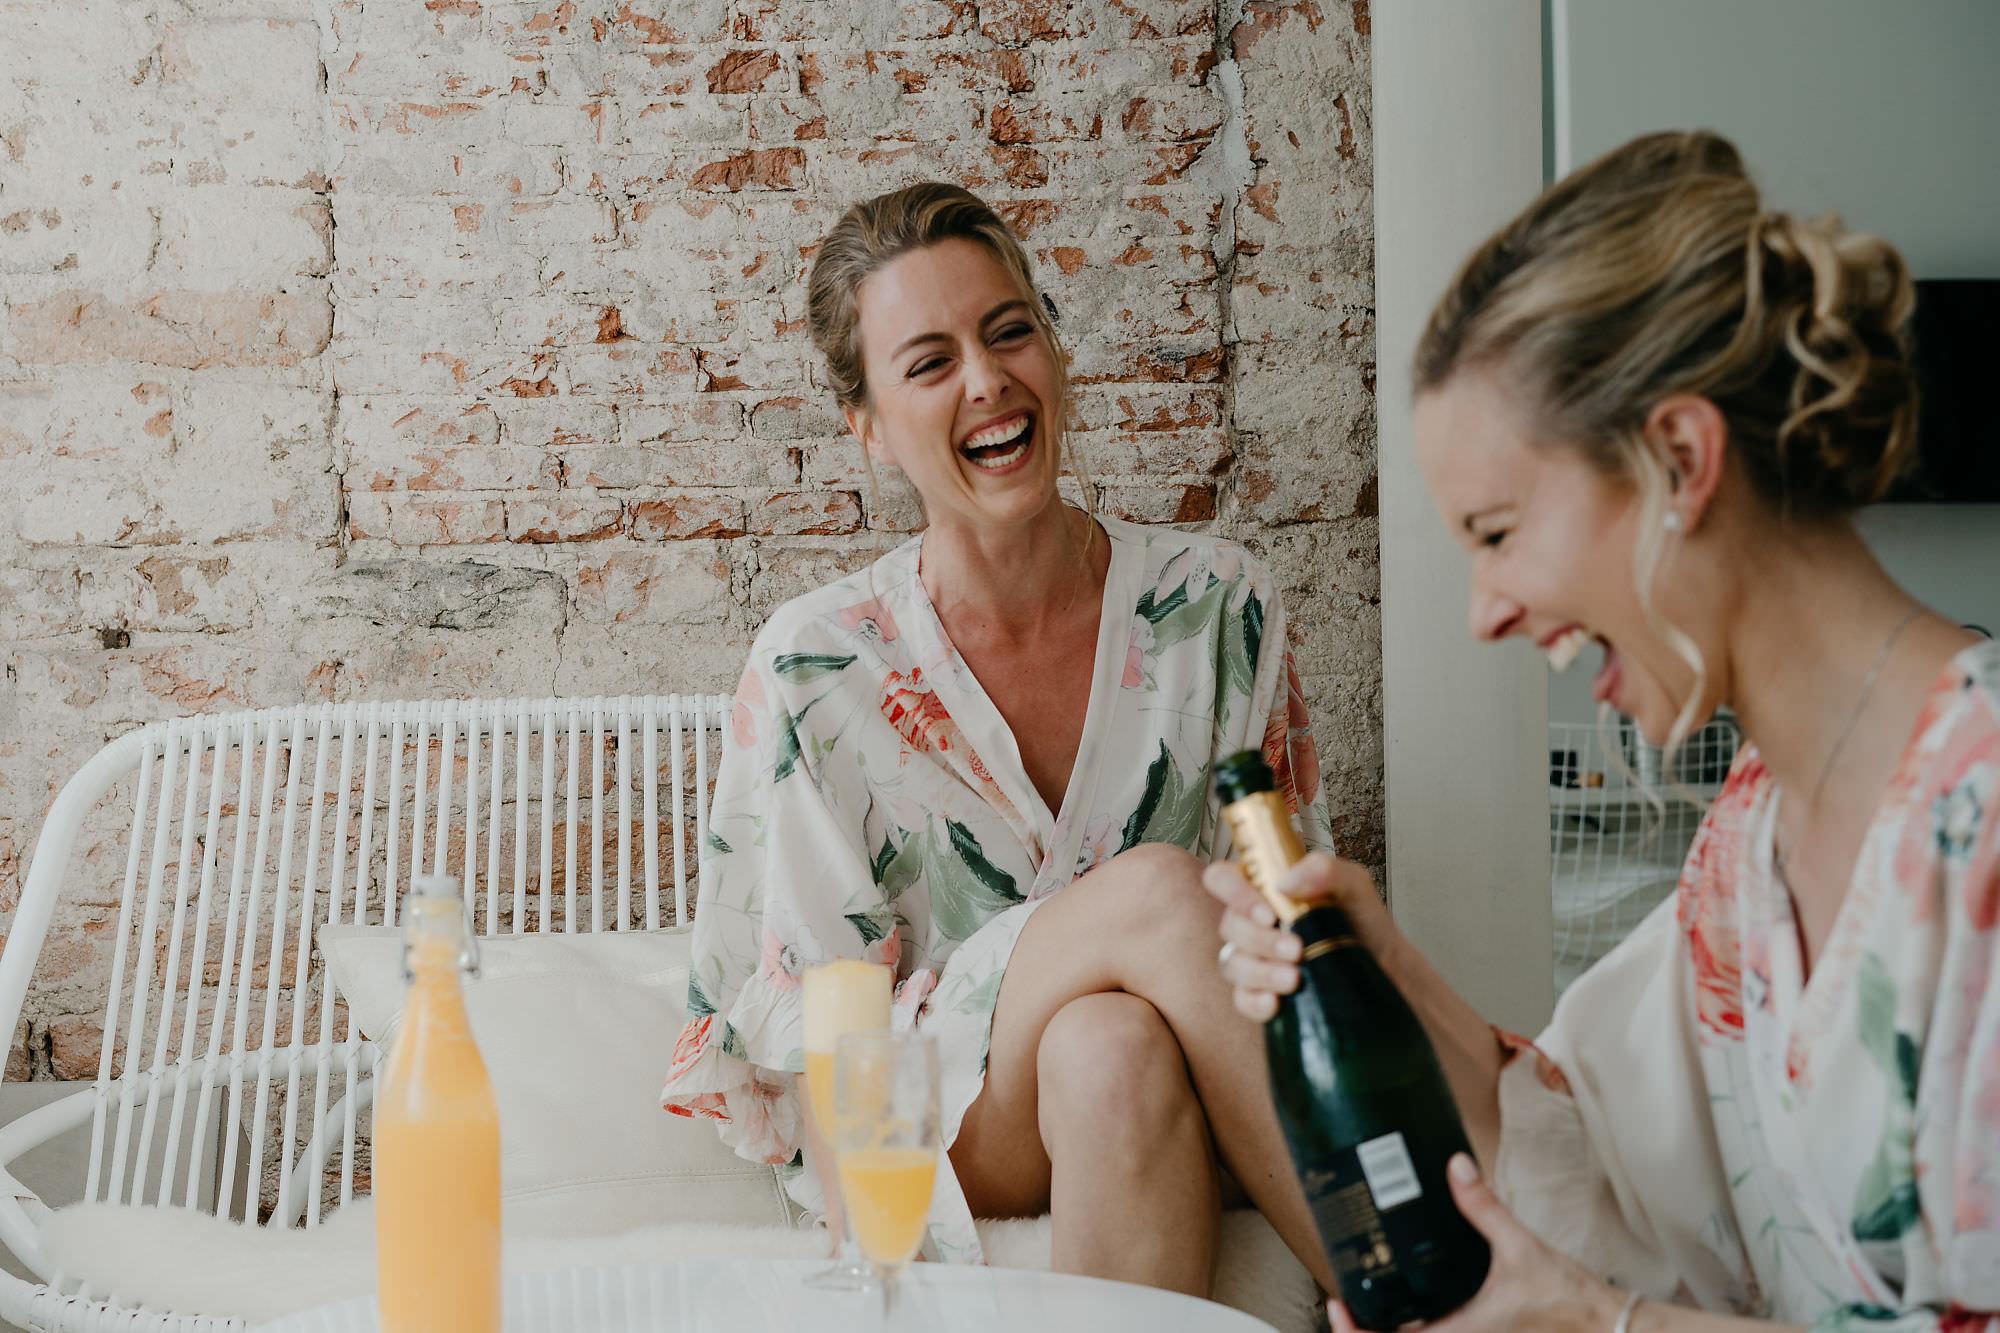 amsterdam trouwfotograaf mark hadden bridal prep in hotel